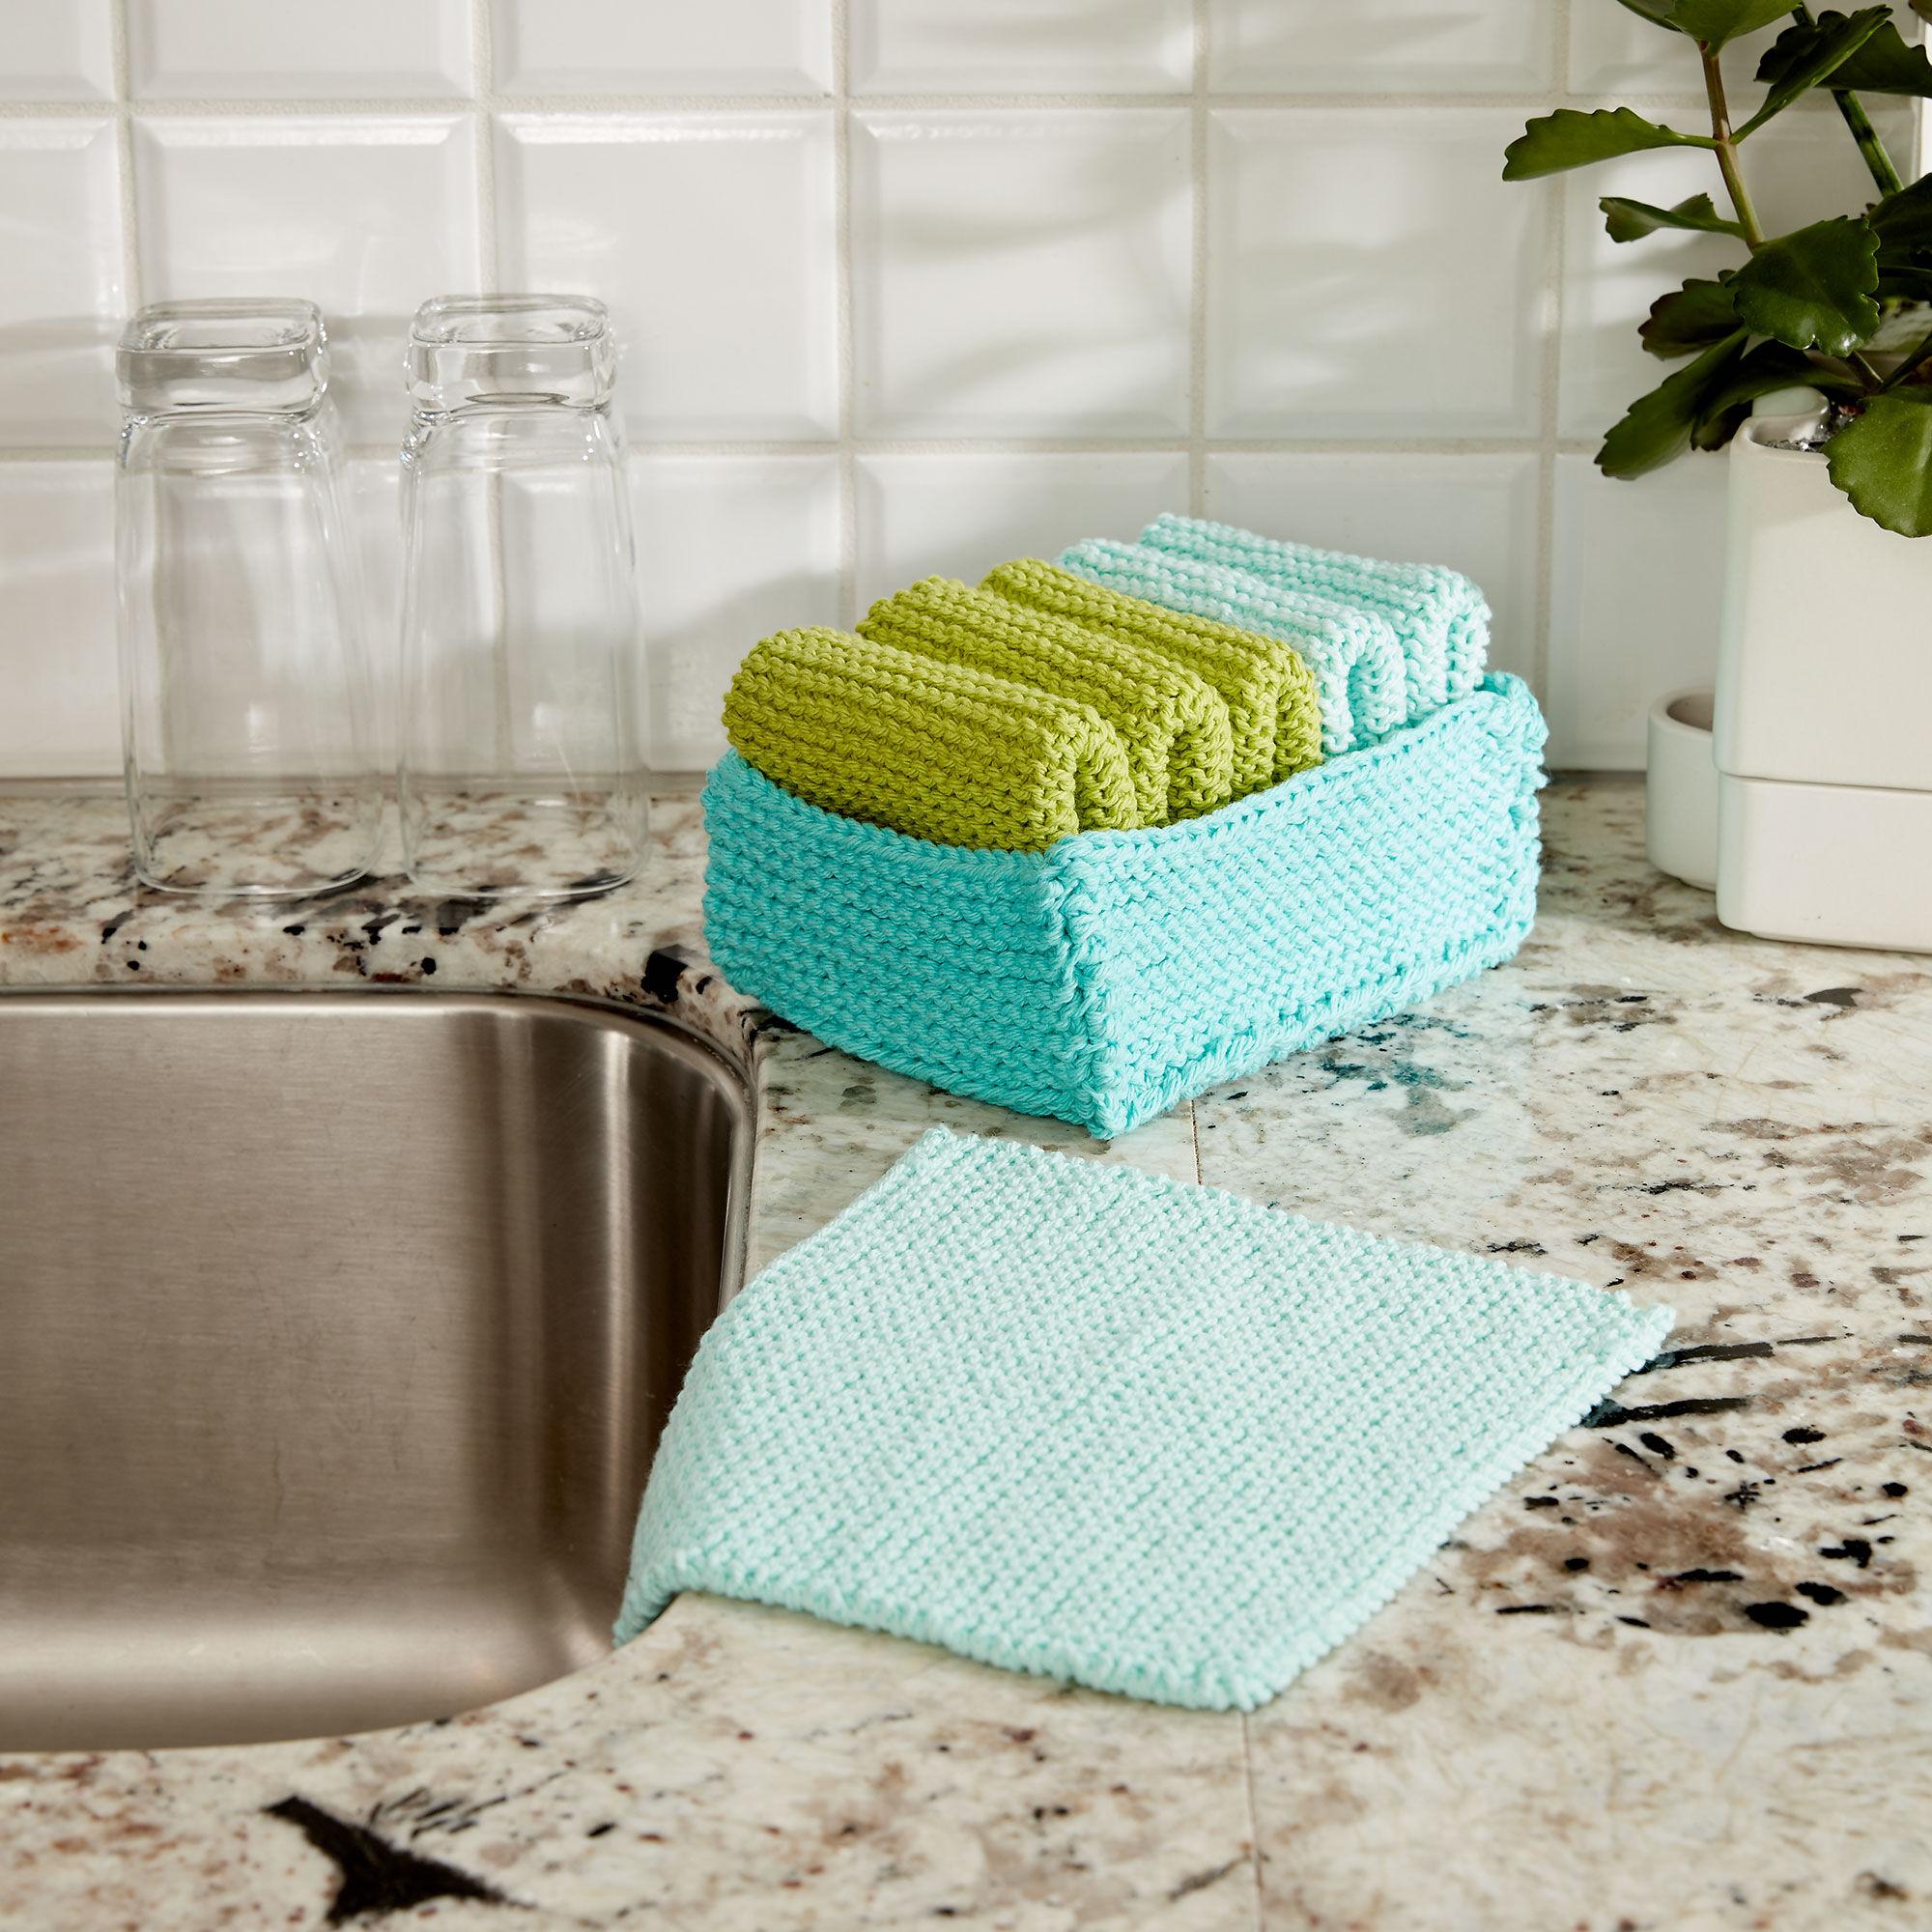 Lily Sugarn Cream Tidy Up Knit Dishcloth And Basket Yarnspirations